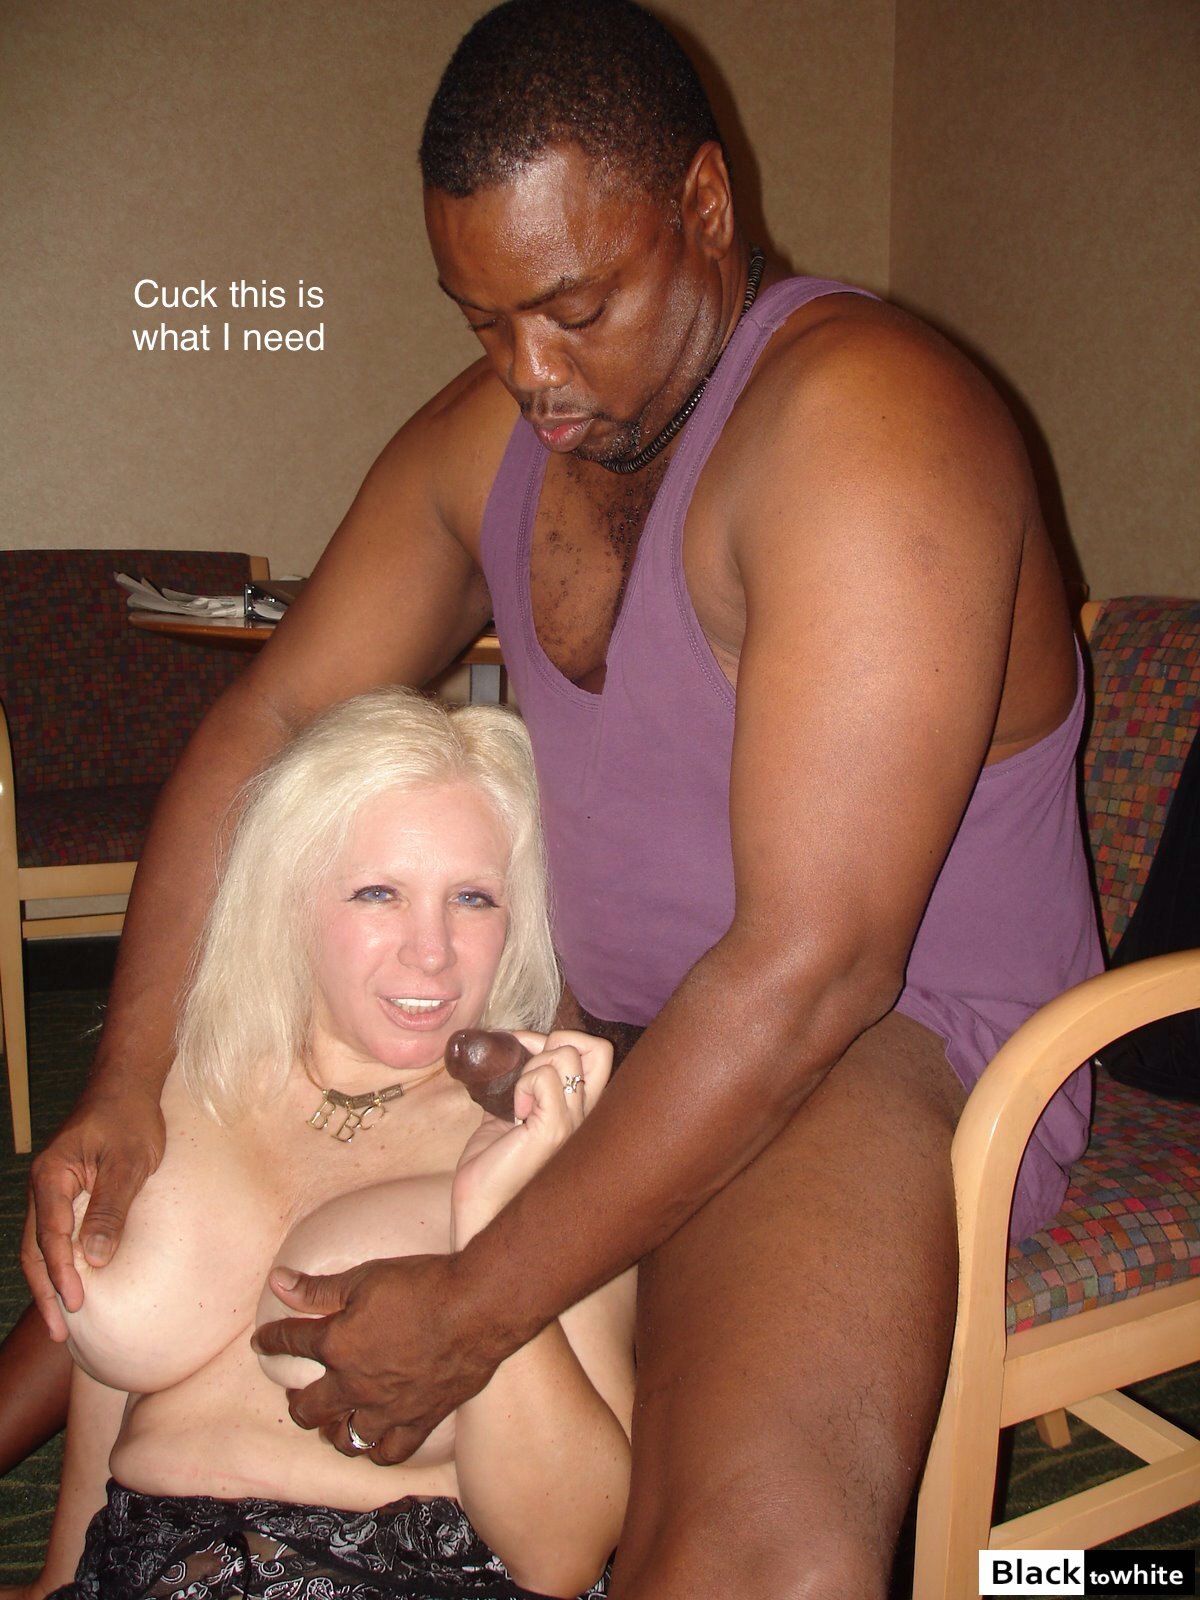 Cuckoldsex